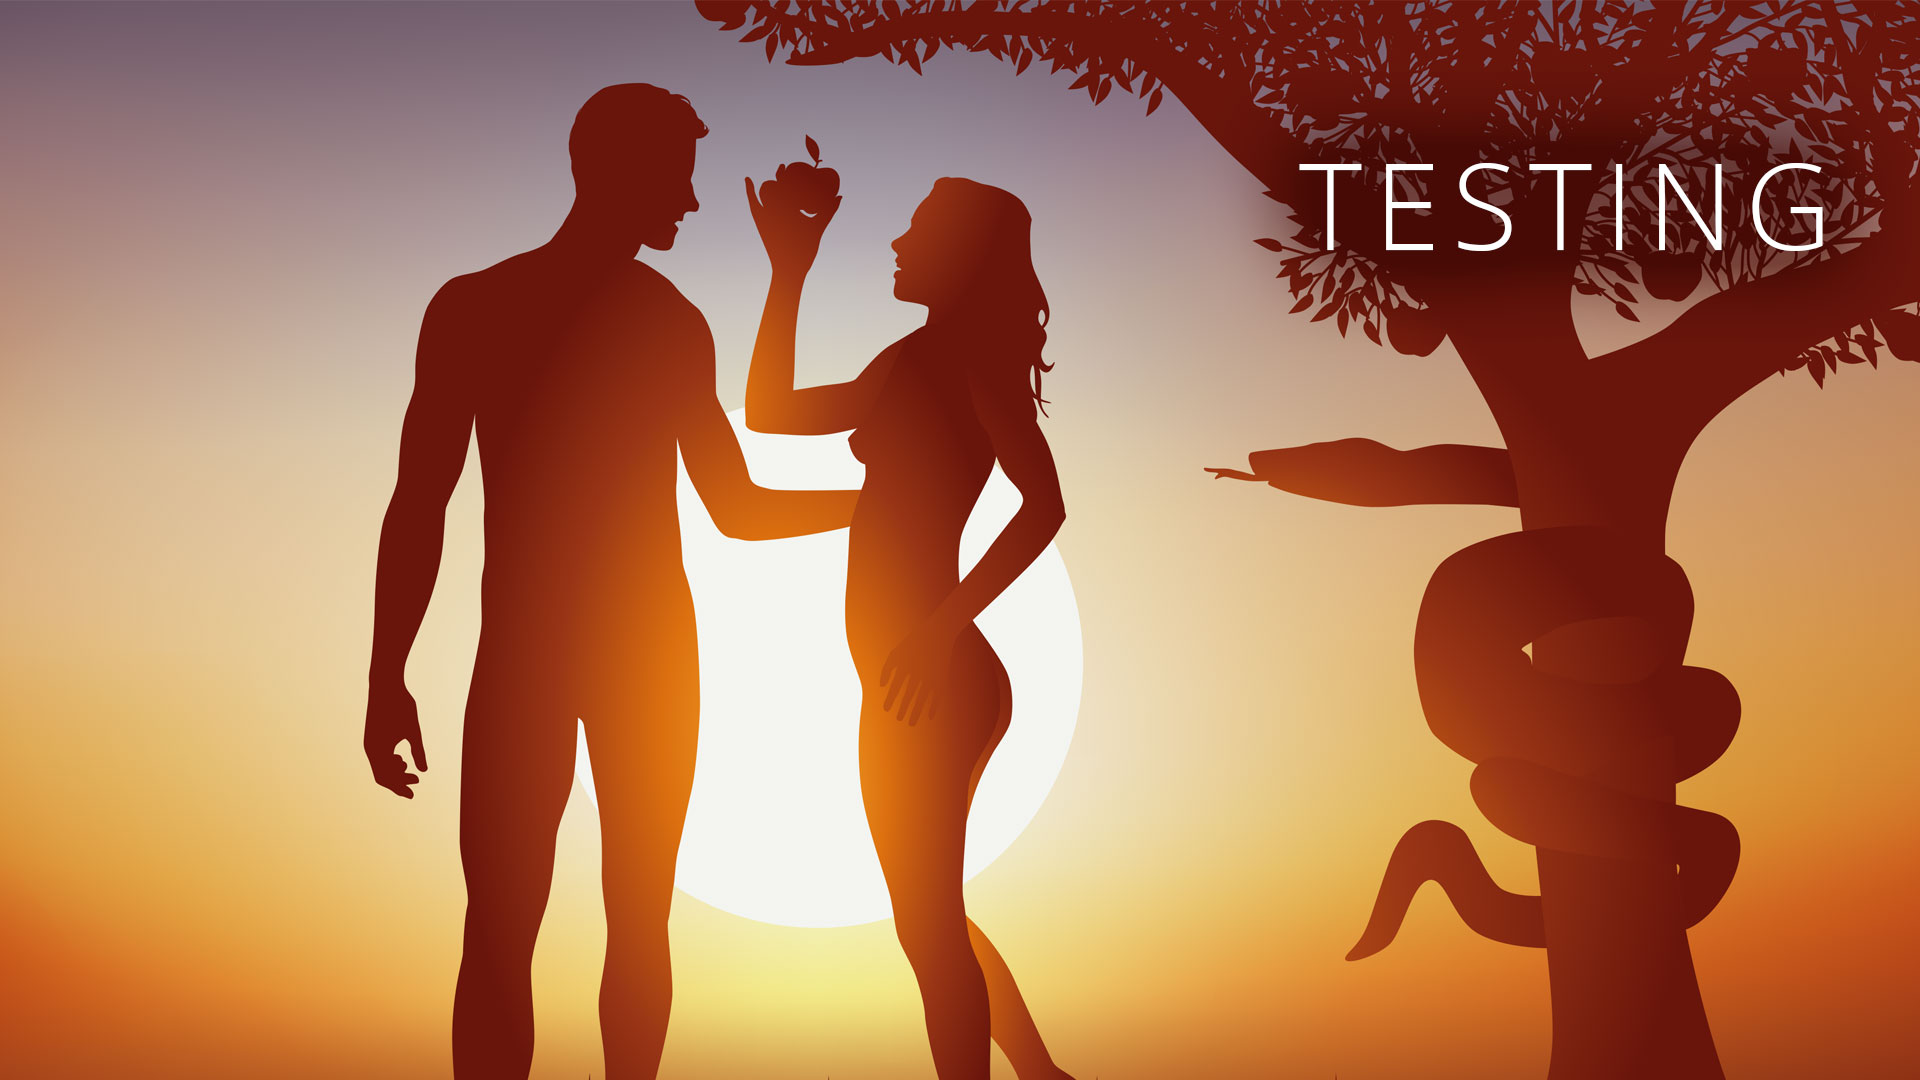 Testing Fails Bavaria Germany Adam and Eve Corona Covid19 PCR Testing